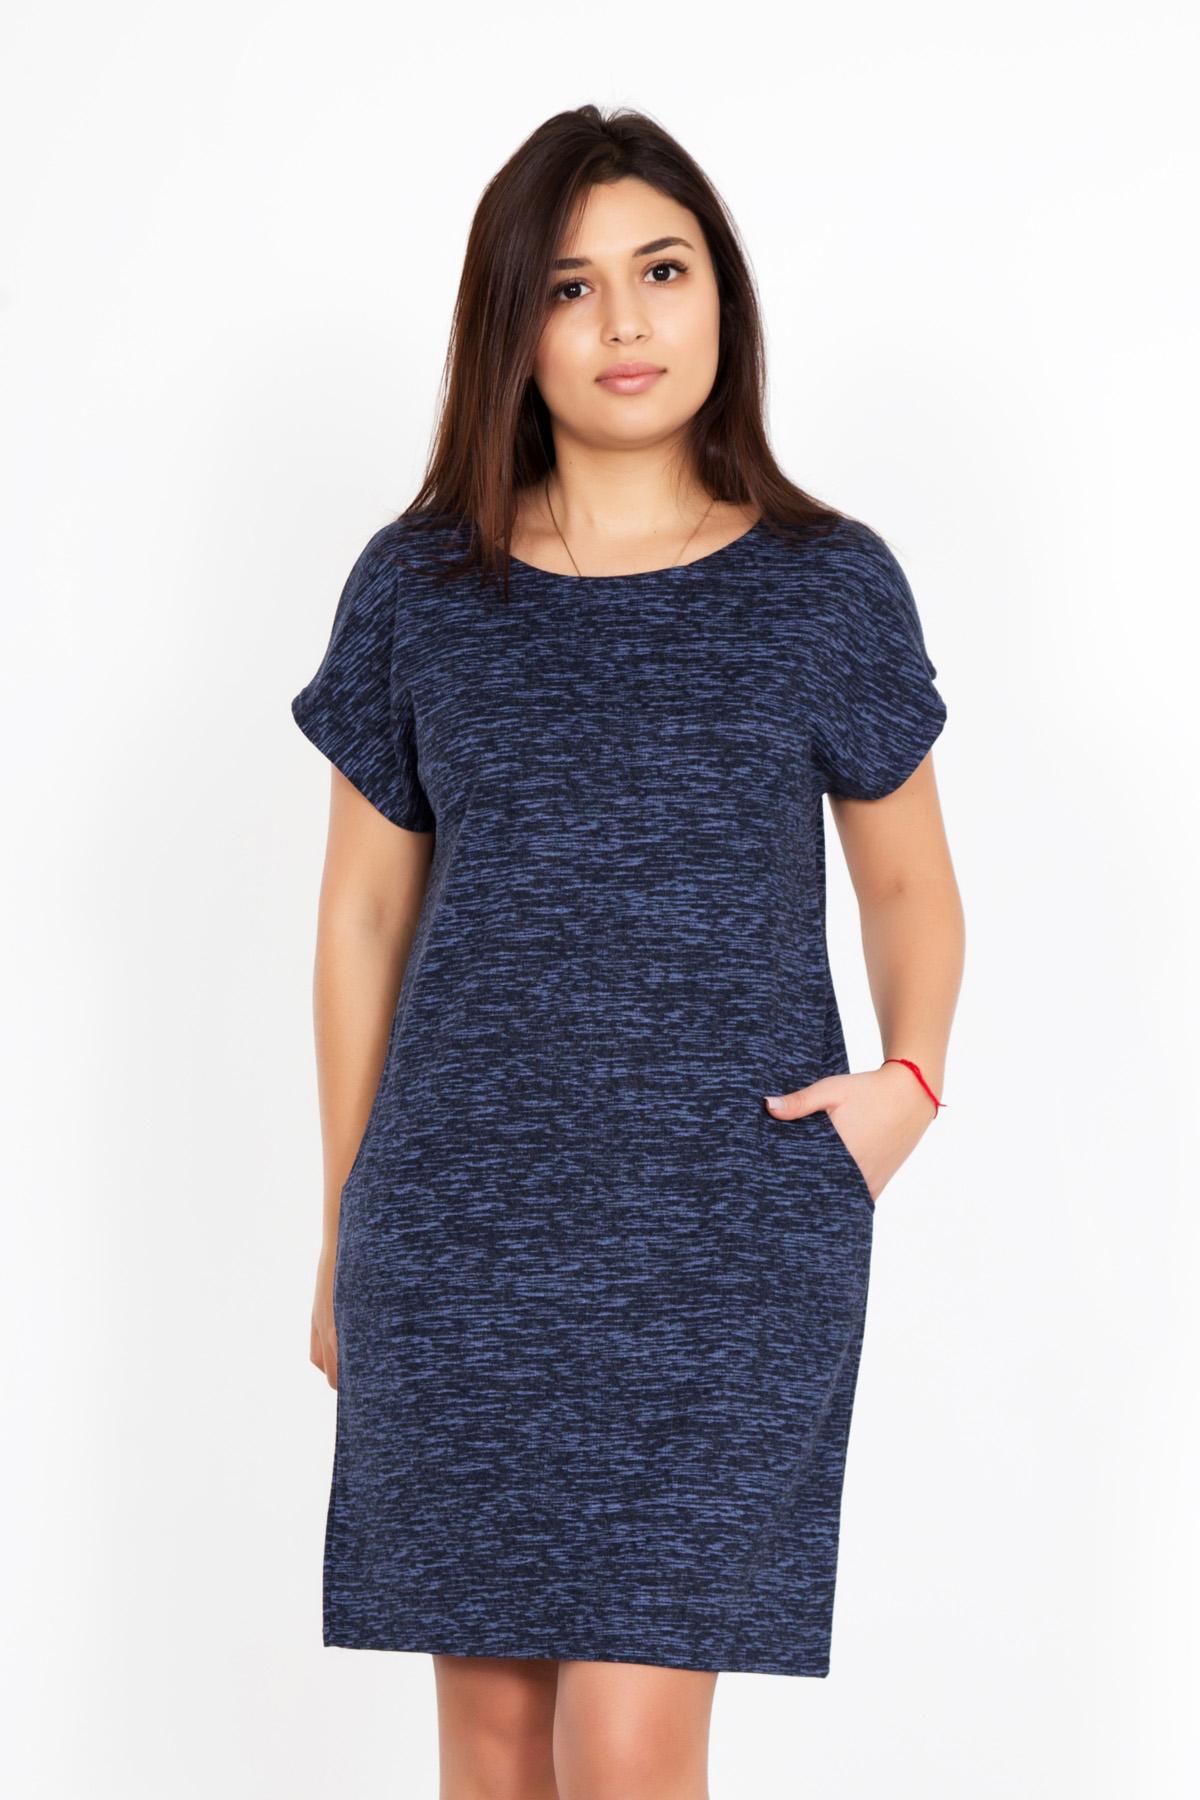 Жен. платье Кайла Синий р. 48Платья, туники<br>Обхват груди:96 см<br>Обхват талии:78 см<br>Обхват бедер:104 см<br>Длина по спинке:84 см<br>Рост:167 см<br><br>Тип: Жен. платье<br>Размер: 48<br>Материал: Футер